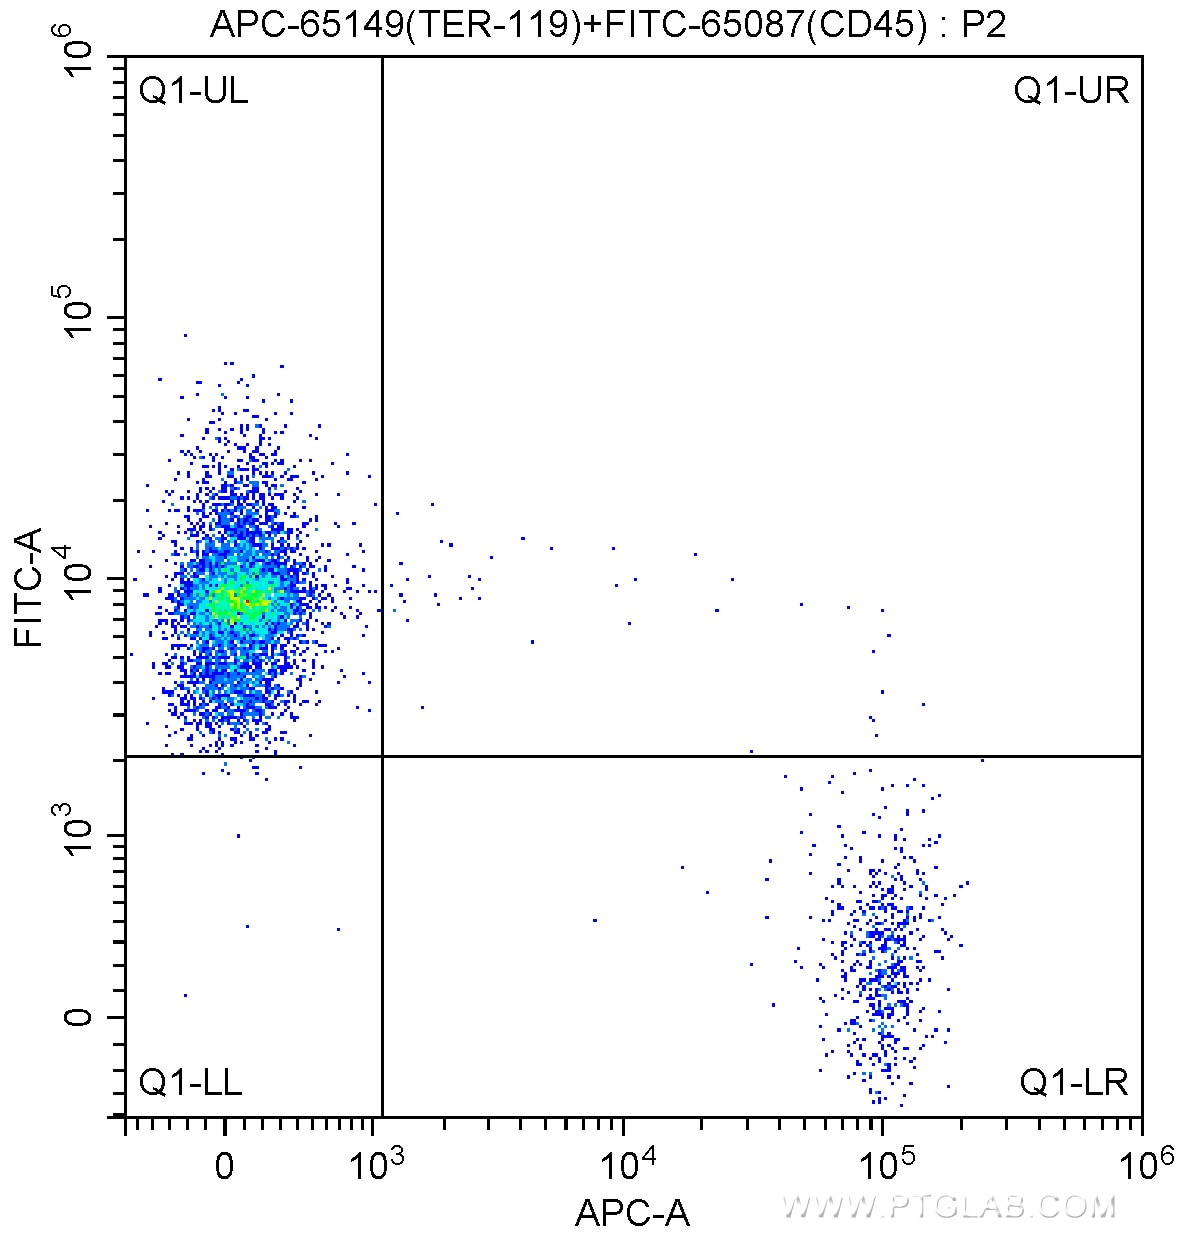 FC experiment of mouse bone marrow cells using APC-65149